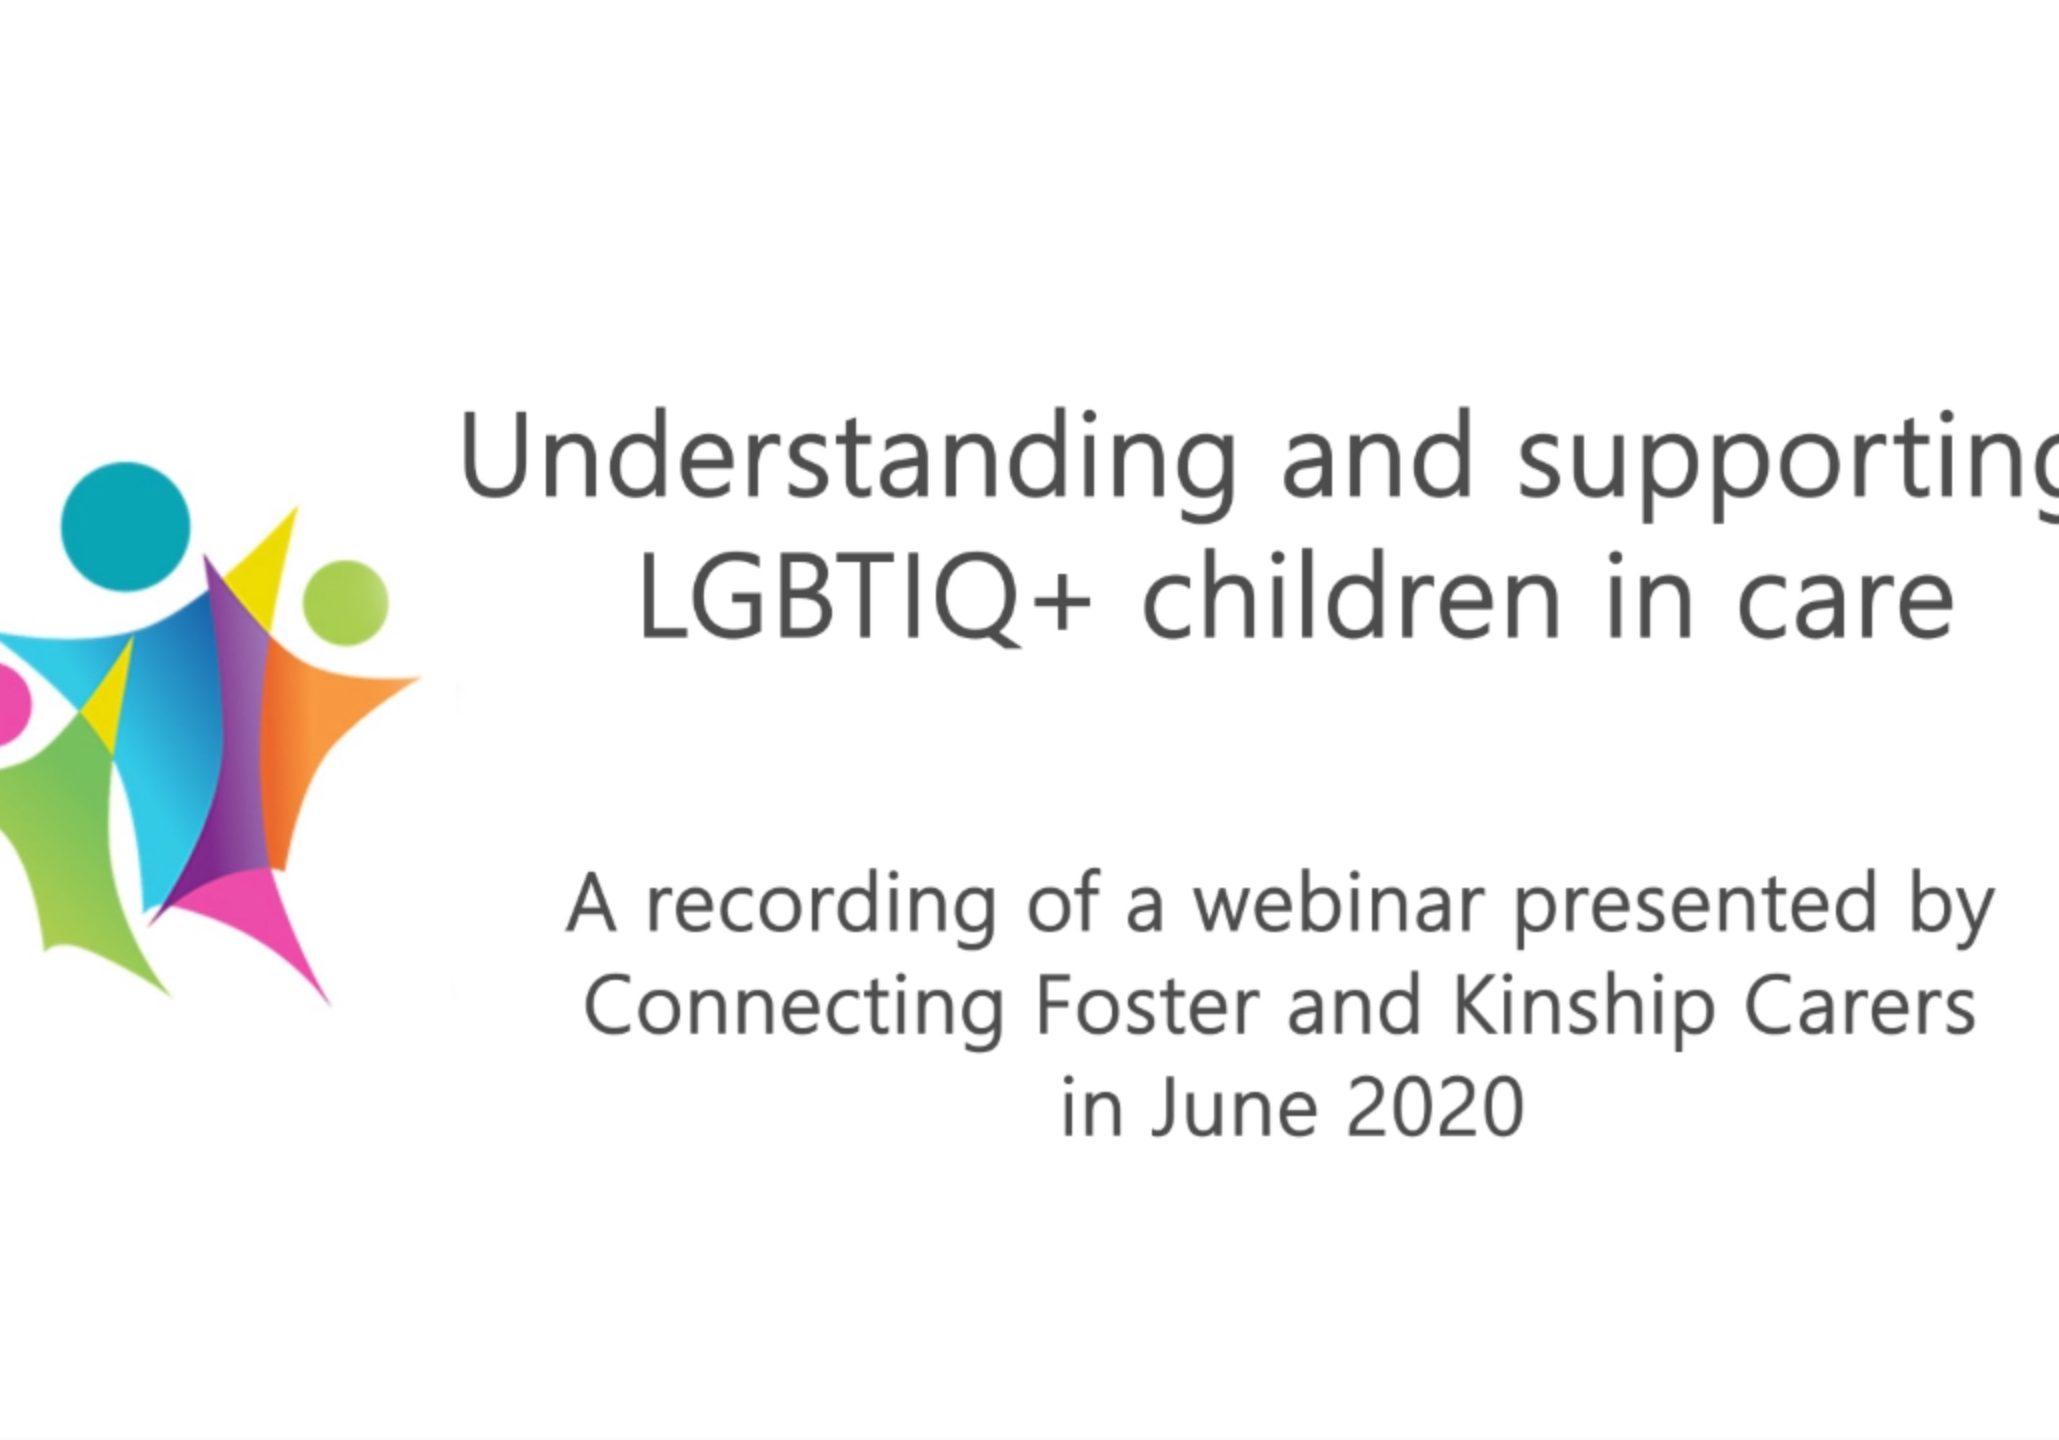 LGBTIQ title slide